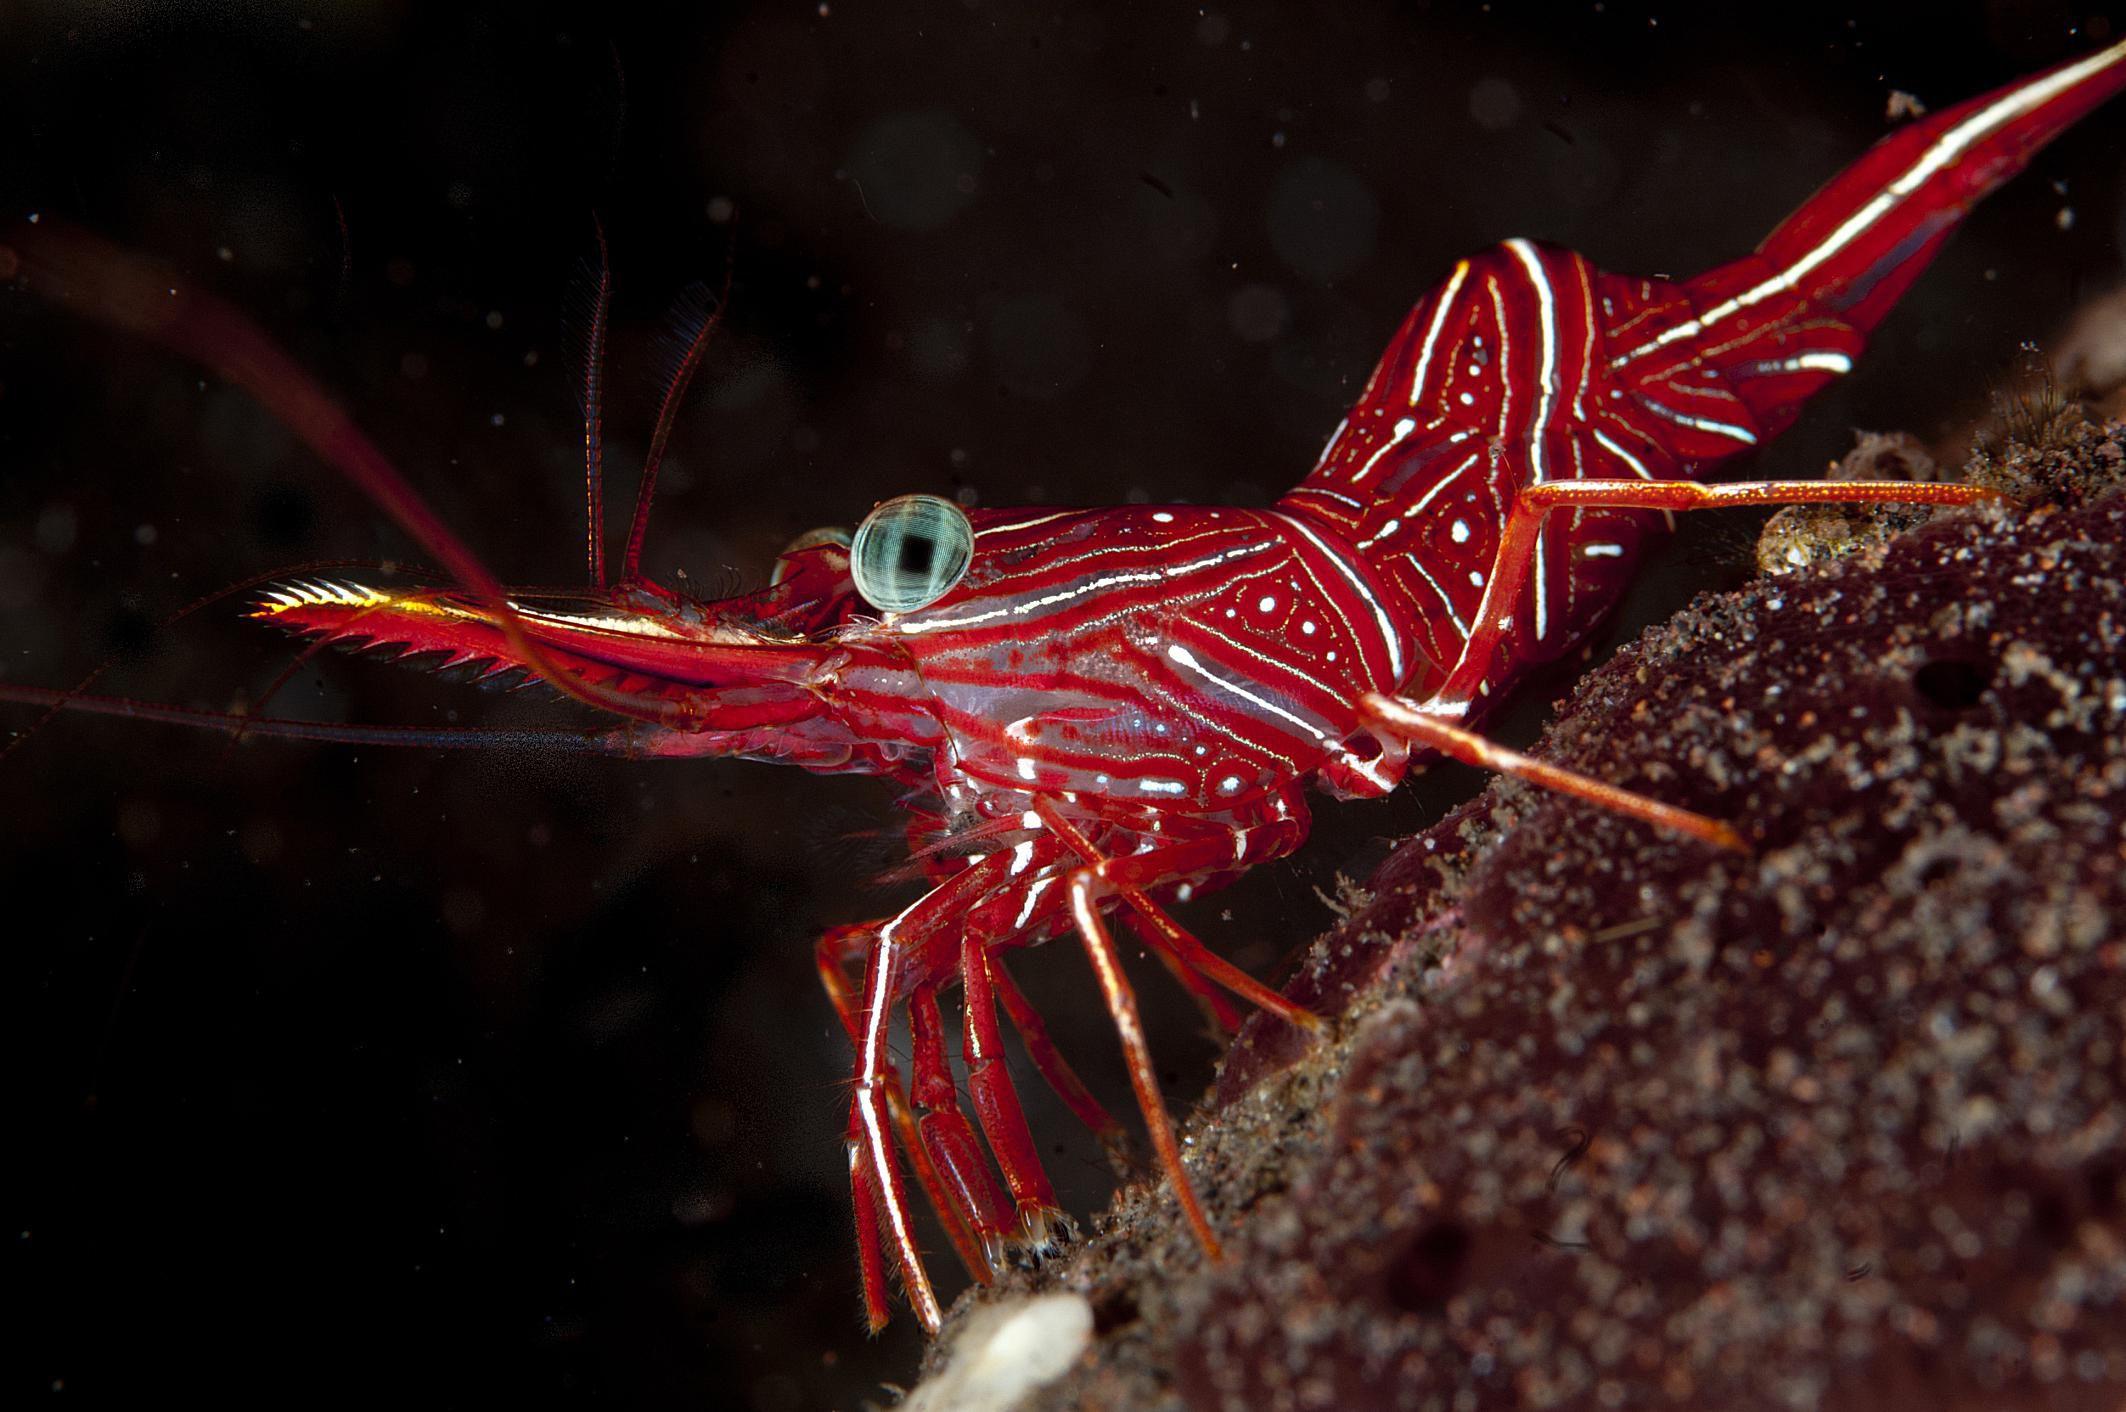 Arthropoda - Gulf Specimen Marine Lab  |Phylum Arthropoda Marine